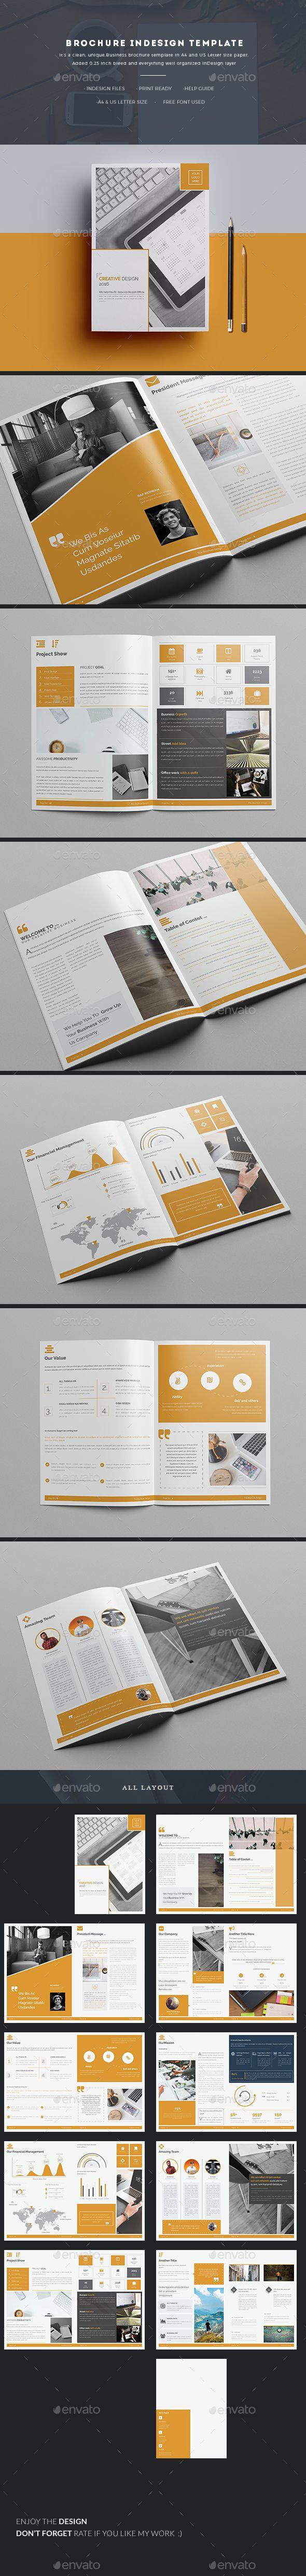 Brochure InDesign Template | User Guide | Pinterest | Apuntes